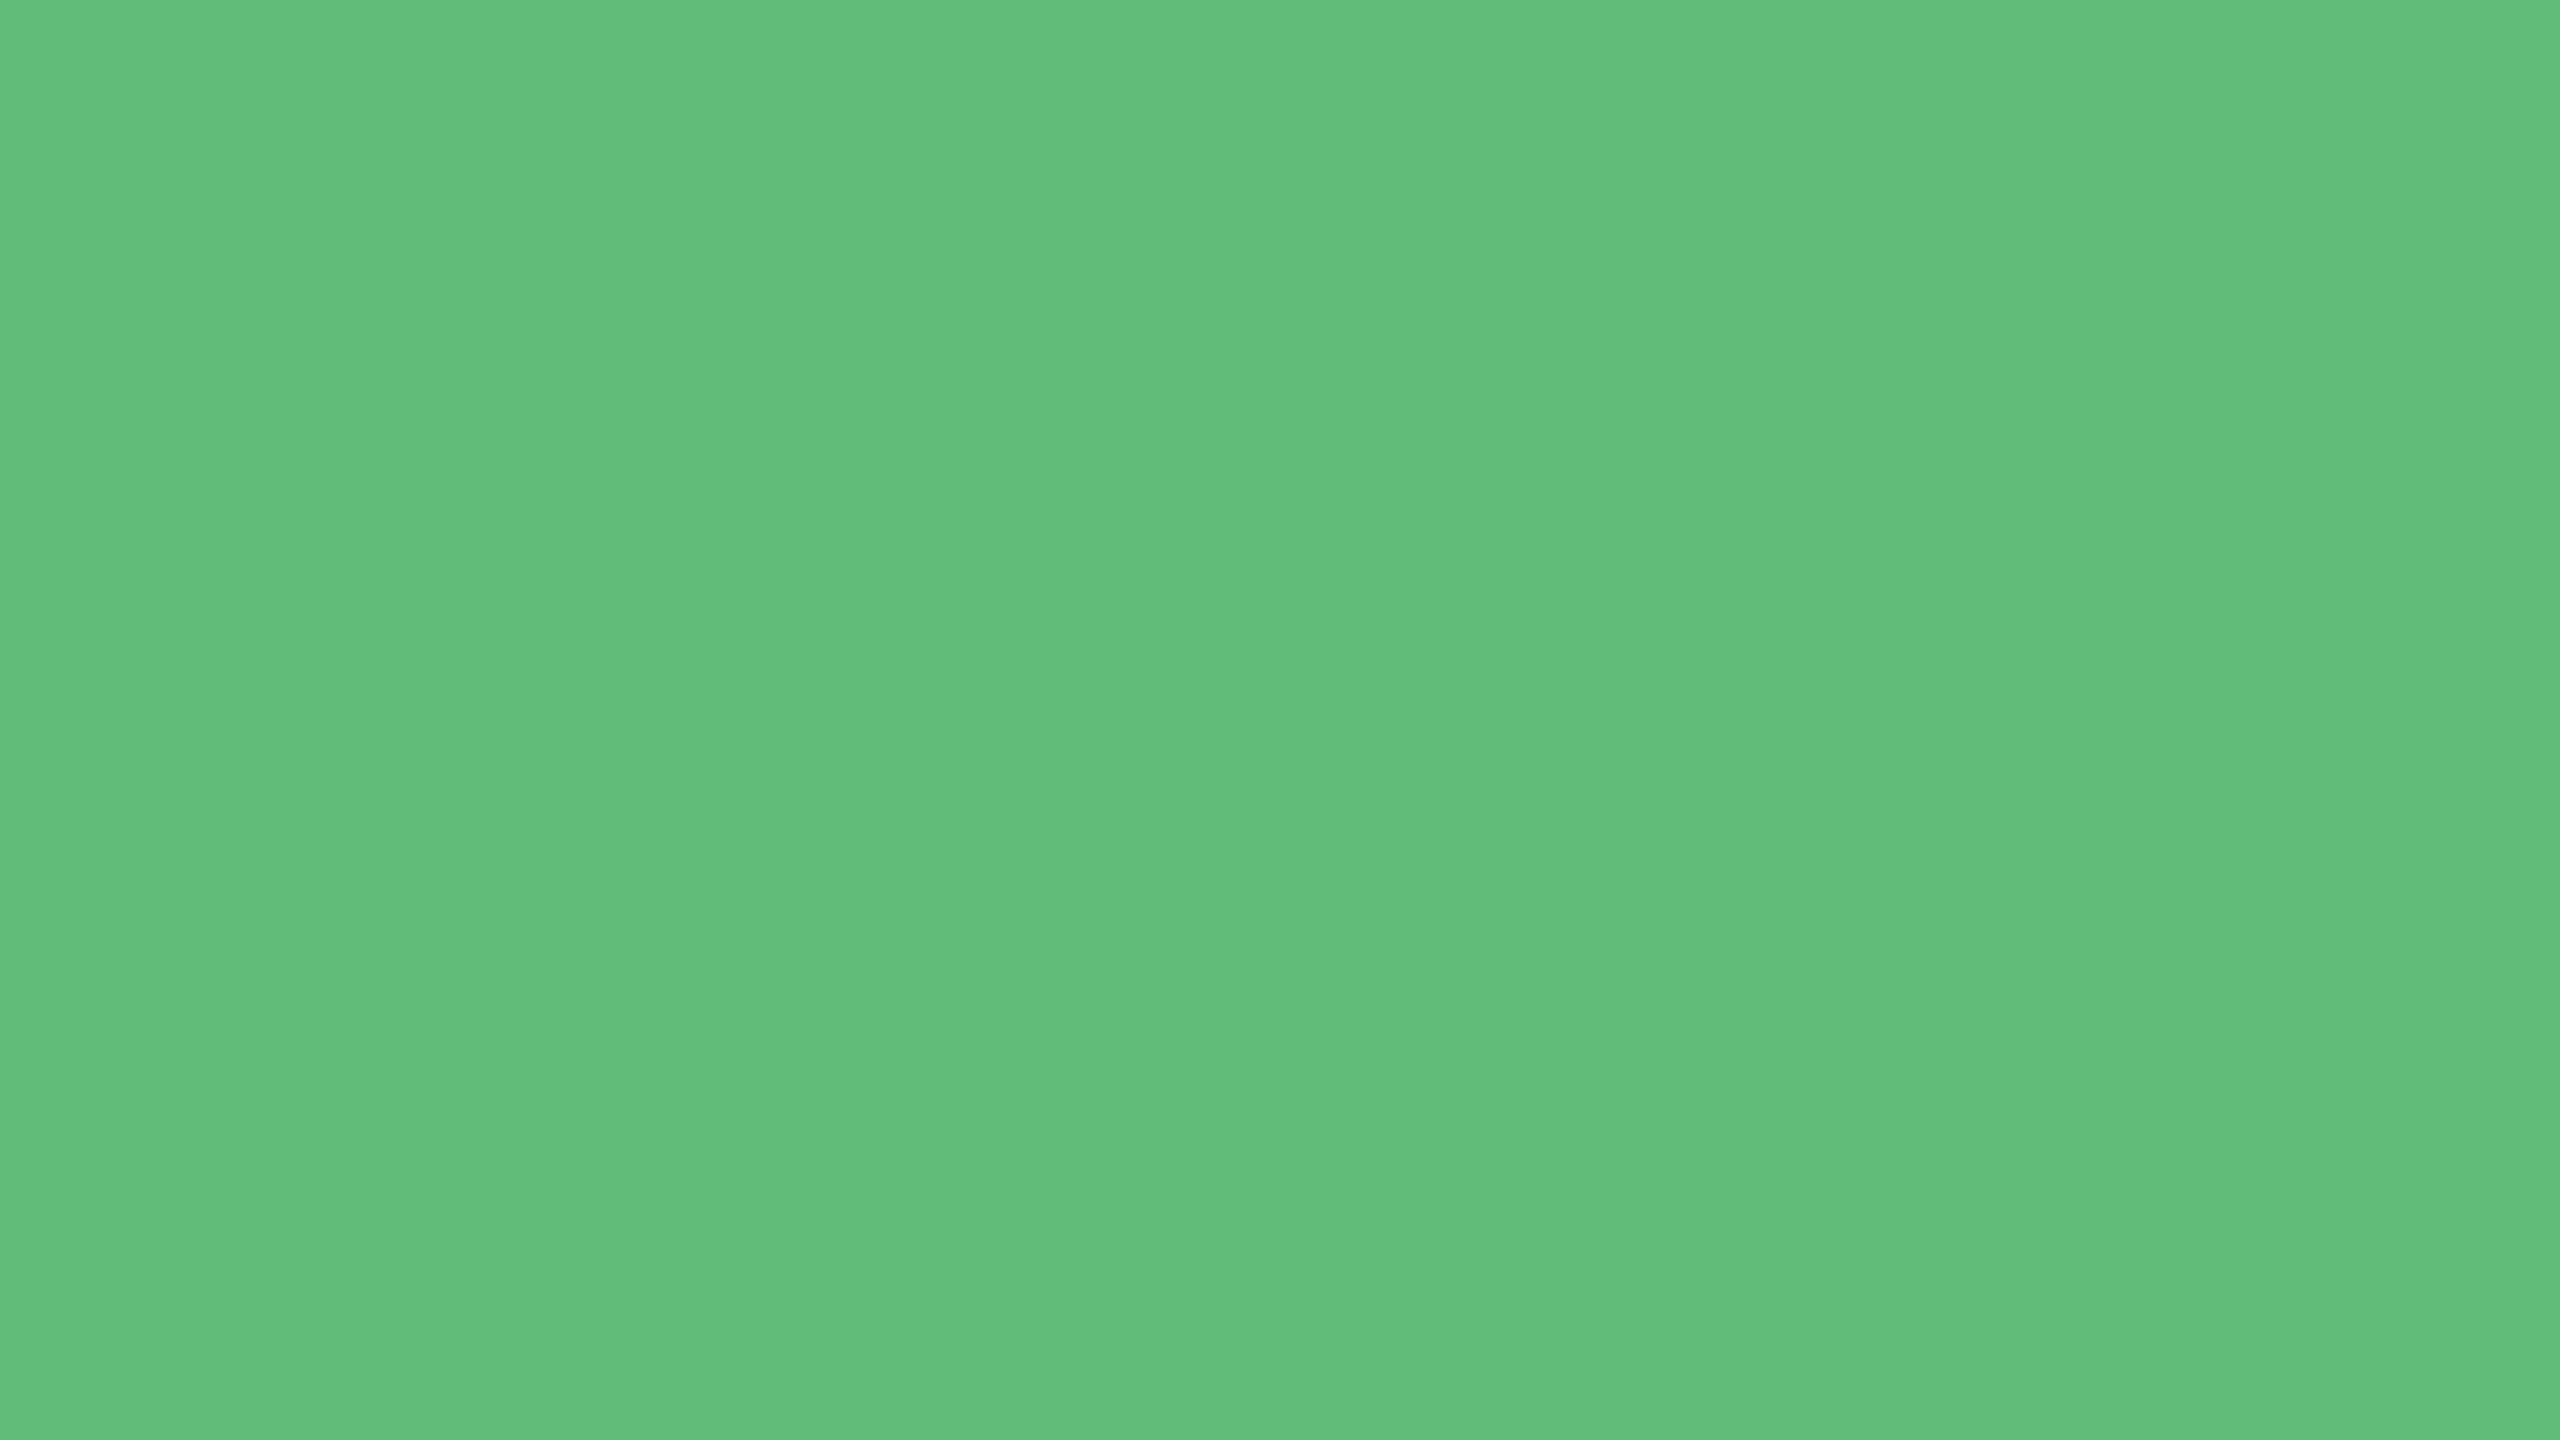 Green_2560x1440px